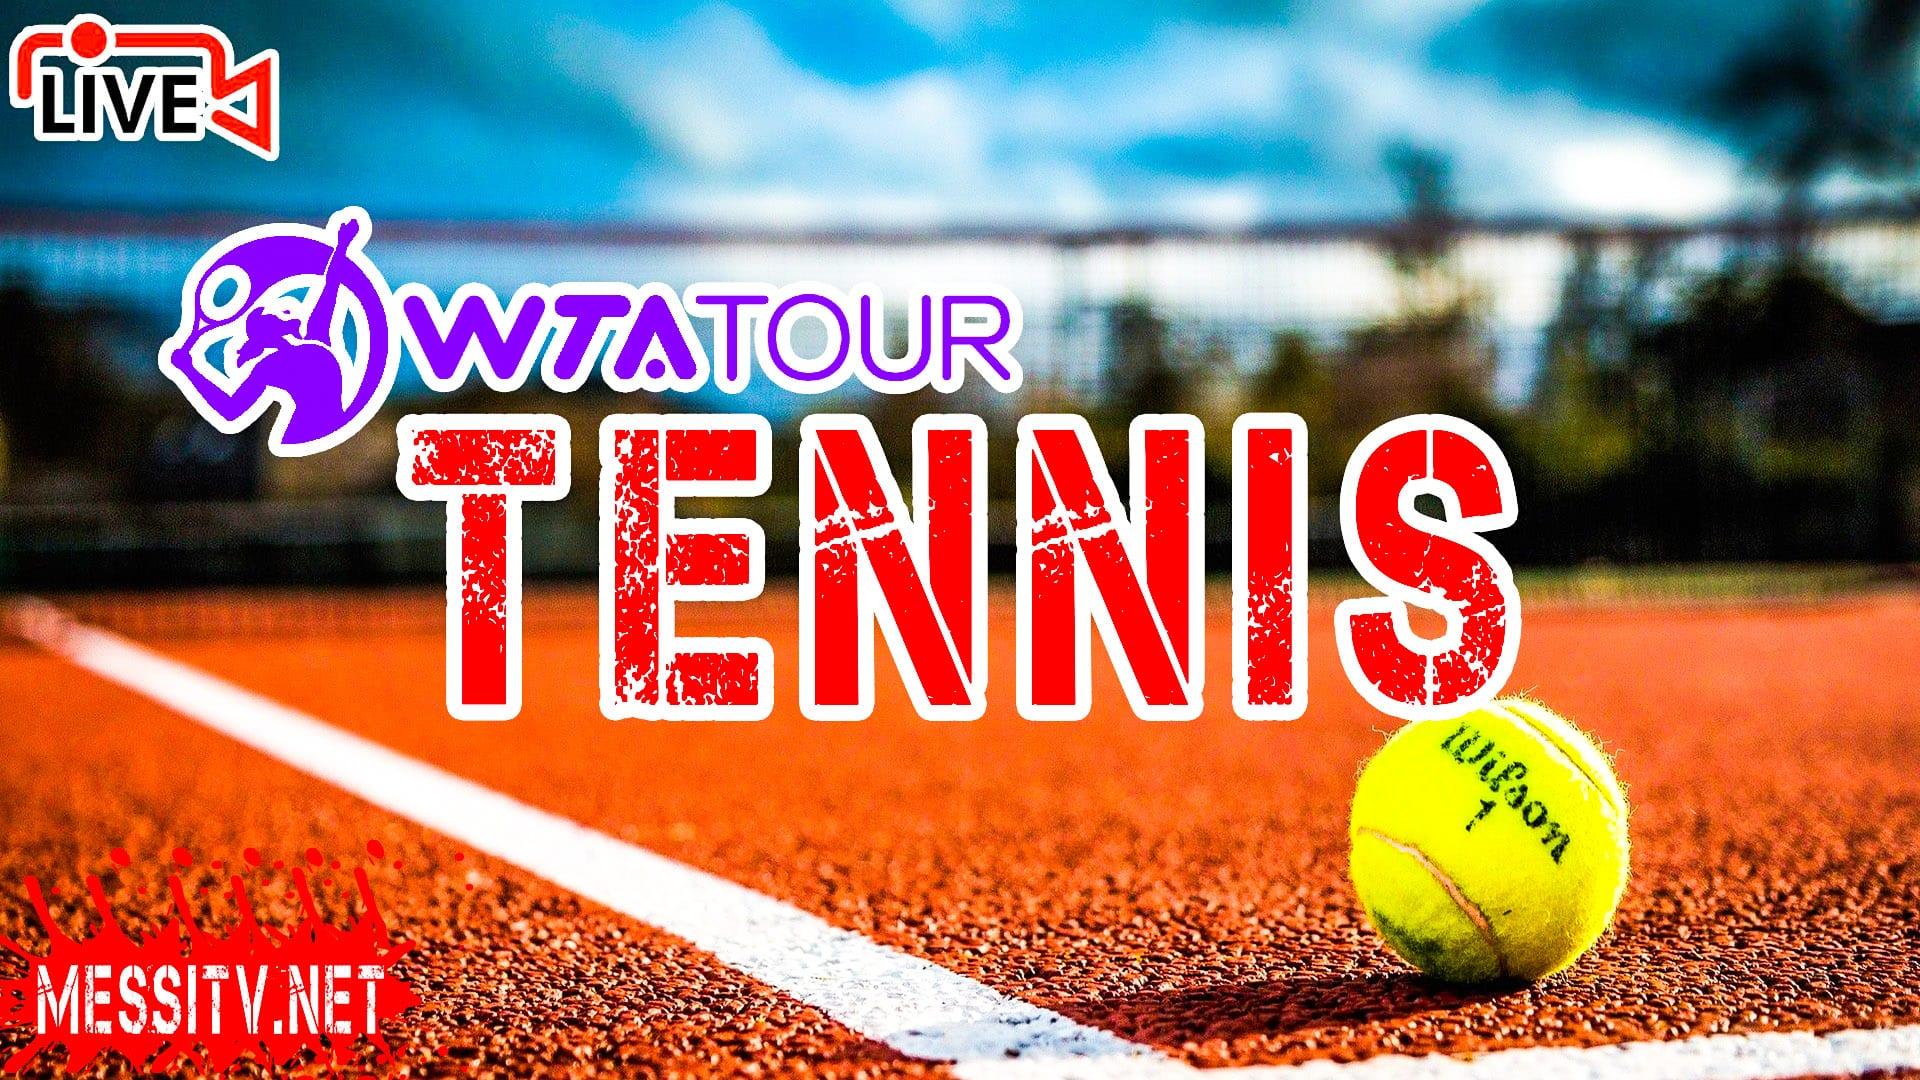 Watch ALL WTA World Tour Tennis Open Live Stream Online [Full HD + 4K + Support Mobile] , Watch WTA Women's Tennis Open Tournament Live Online, Watch WTA World Tour Chicago Fall Tennis Classic (USA) Live Online, Watch WTA World Tour Astana Open (Nur-Sultan, Kazakhstan) Live Online, WTA 125, WTA 250, WTA 500, WTA 1000, WTA World Tour Men's and Women, Men's Singles, Women's Singles, Men's Doubles, Women's Doubles, Tennis Highlights & FULL Match Replay HD, Ver WTA Tennis en vivo en línea, Regardez WTA Tennis en direct en ligne, Sehen Sie Tennis Live Online, Guarda WTA Tennis in diretta online, Assistir WTA Tennis ao vivo online